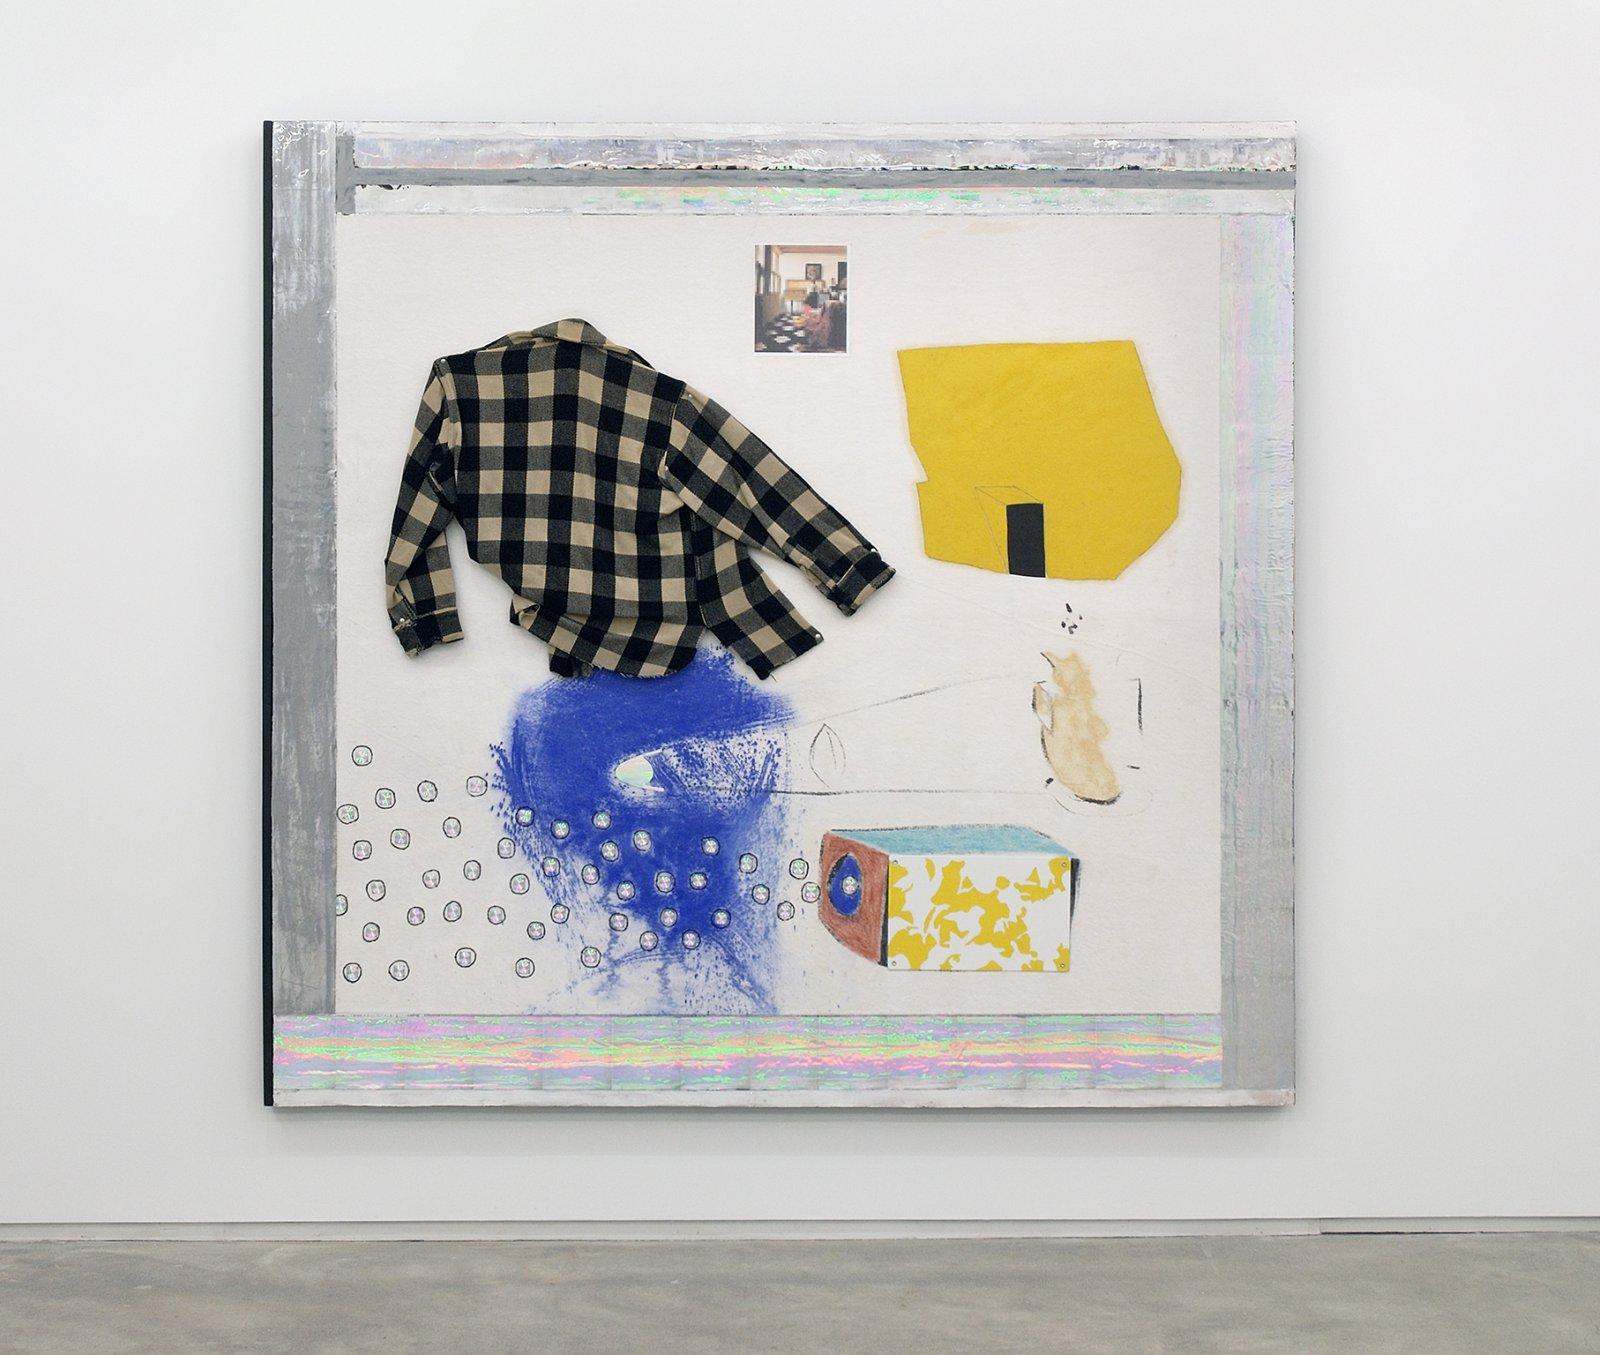 Jerry Pethick, Vermeeror, 1995–1997, wool shirt, spectrafoil, sulphur, chalk, pastel, inkjet print, felt, acrylic paint, aluminum push-pins, 80 x 83 x 3 in. (203 x 211 x 8 cm)   by Jerry Pethick